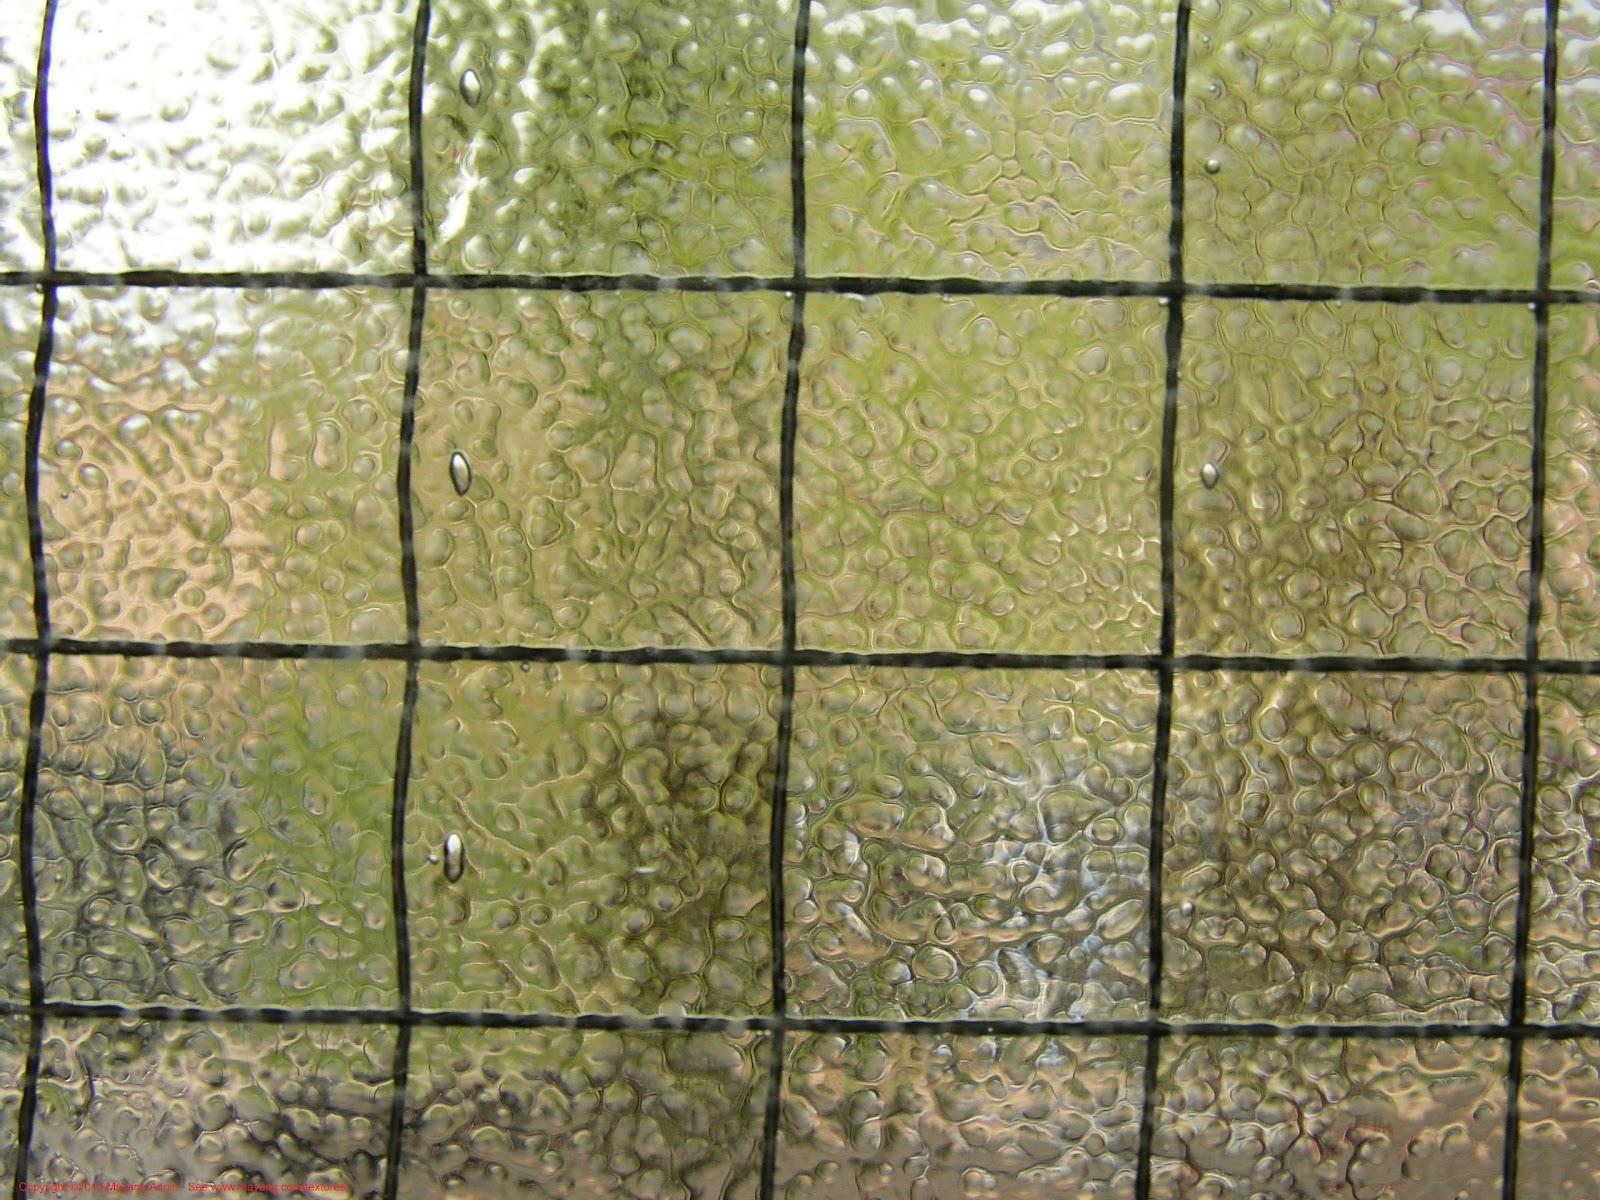 mayangs textures manmade food - photo #25